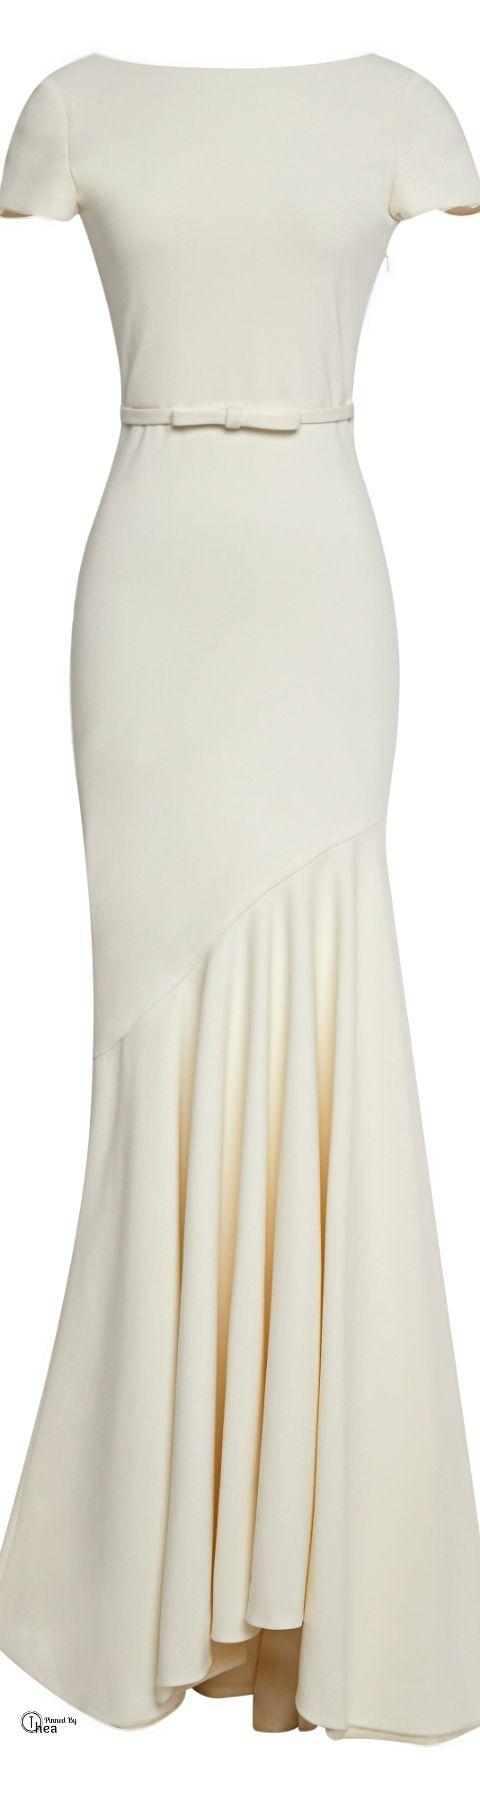 Katie Ermilio ● FW 2014, Ivory Cream Short Sleeve Scoop-Back Gown